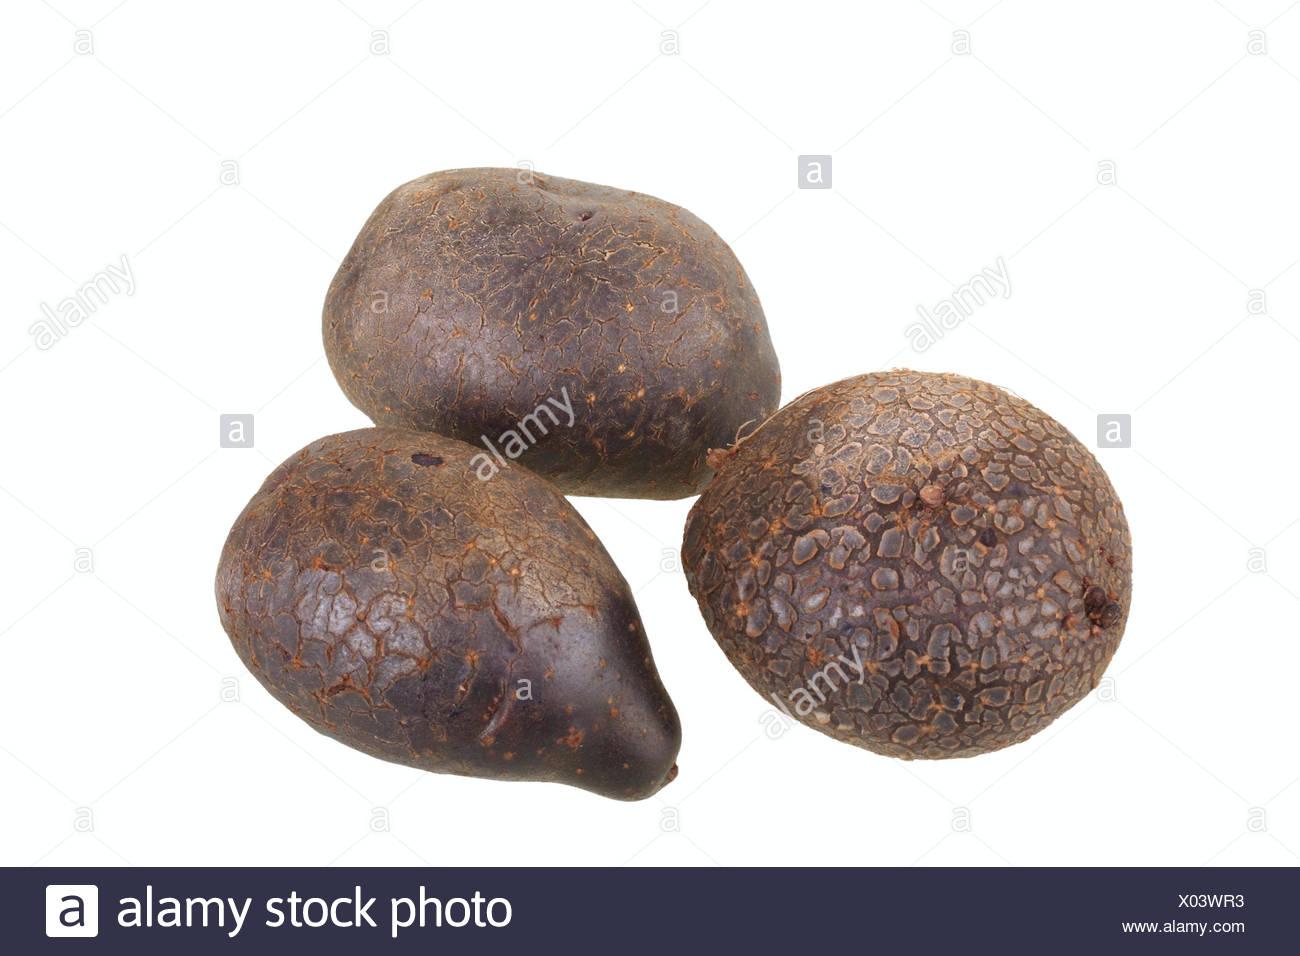 Potatoes, 'Blaue Anneliese' variety - Stock Image